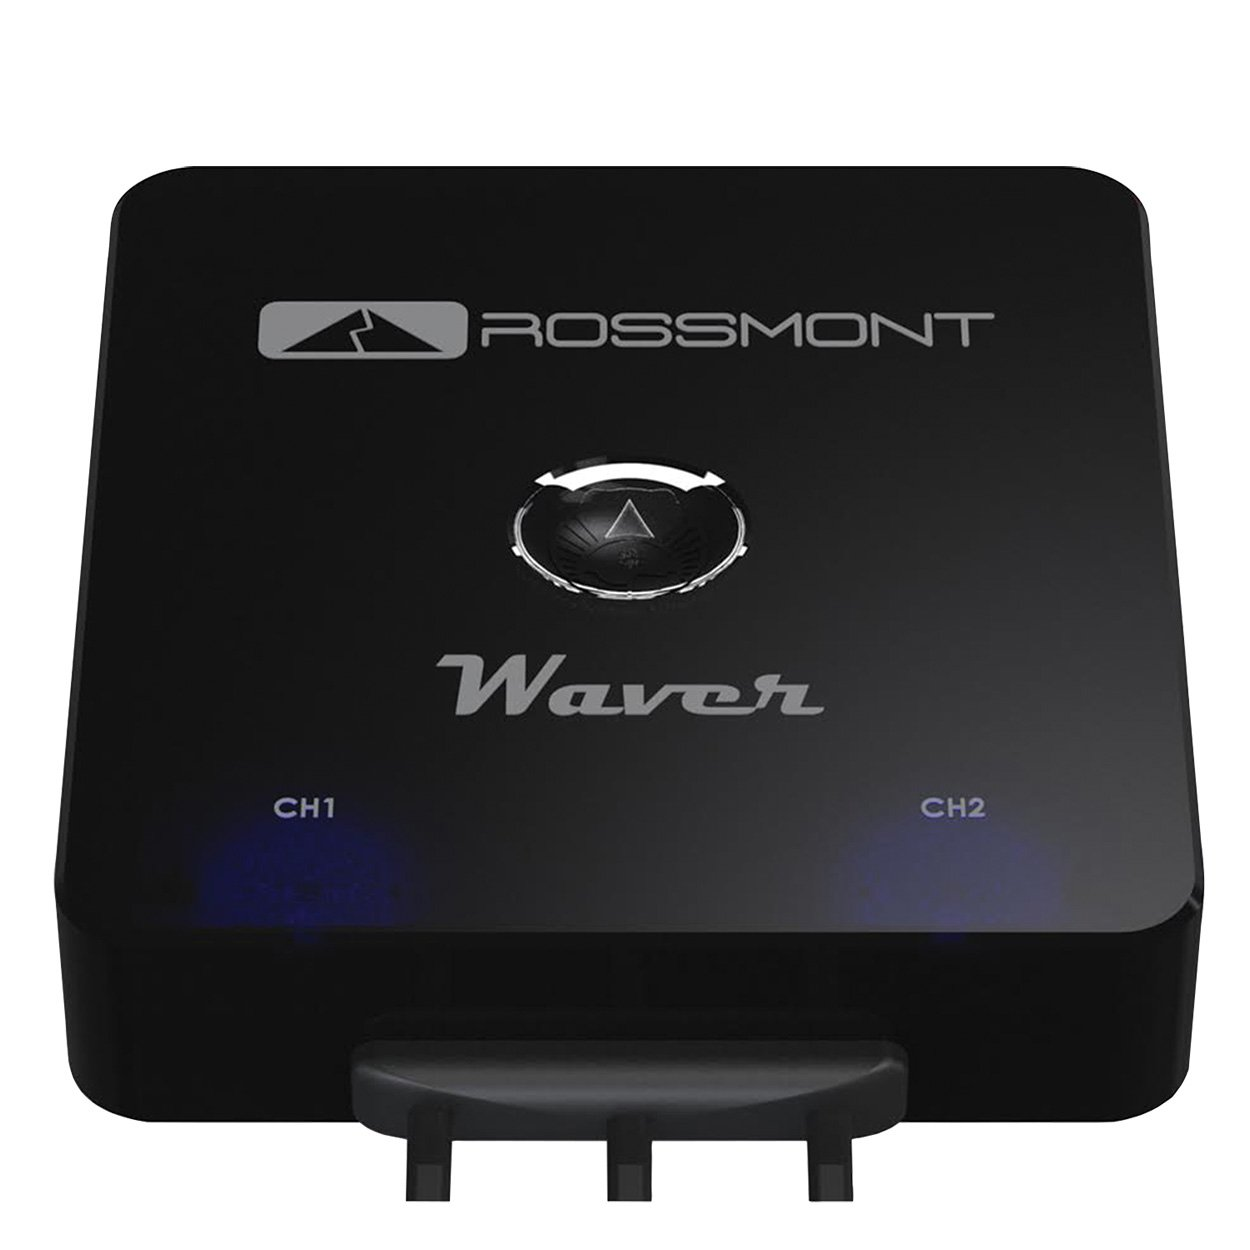 Rossmont 76020 Waver AC Pump controller